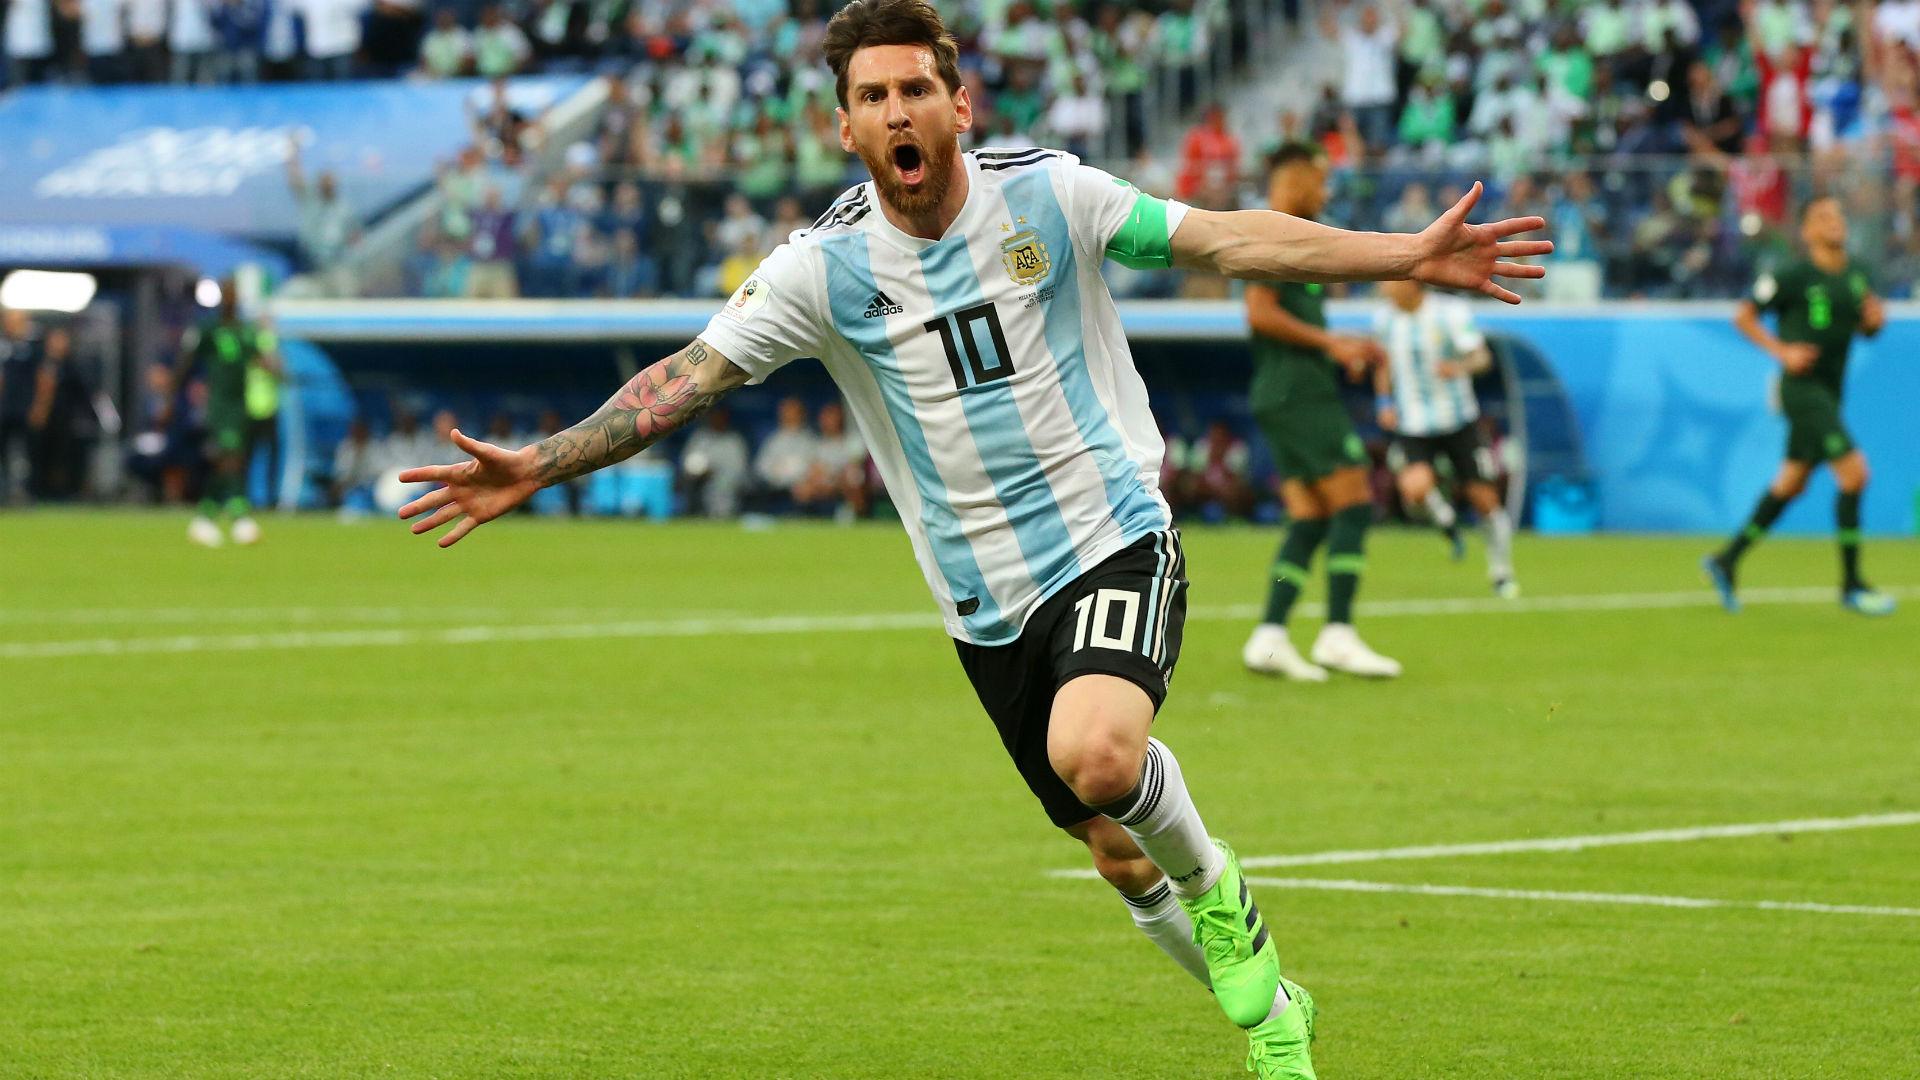 Lionel Messi Argentina Nigeria World Cup Russi 2018 26062018 ed435968d